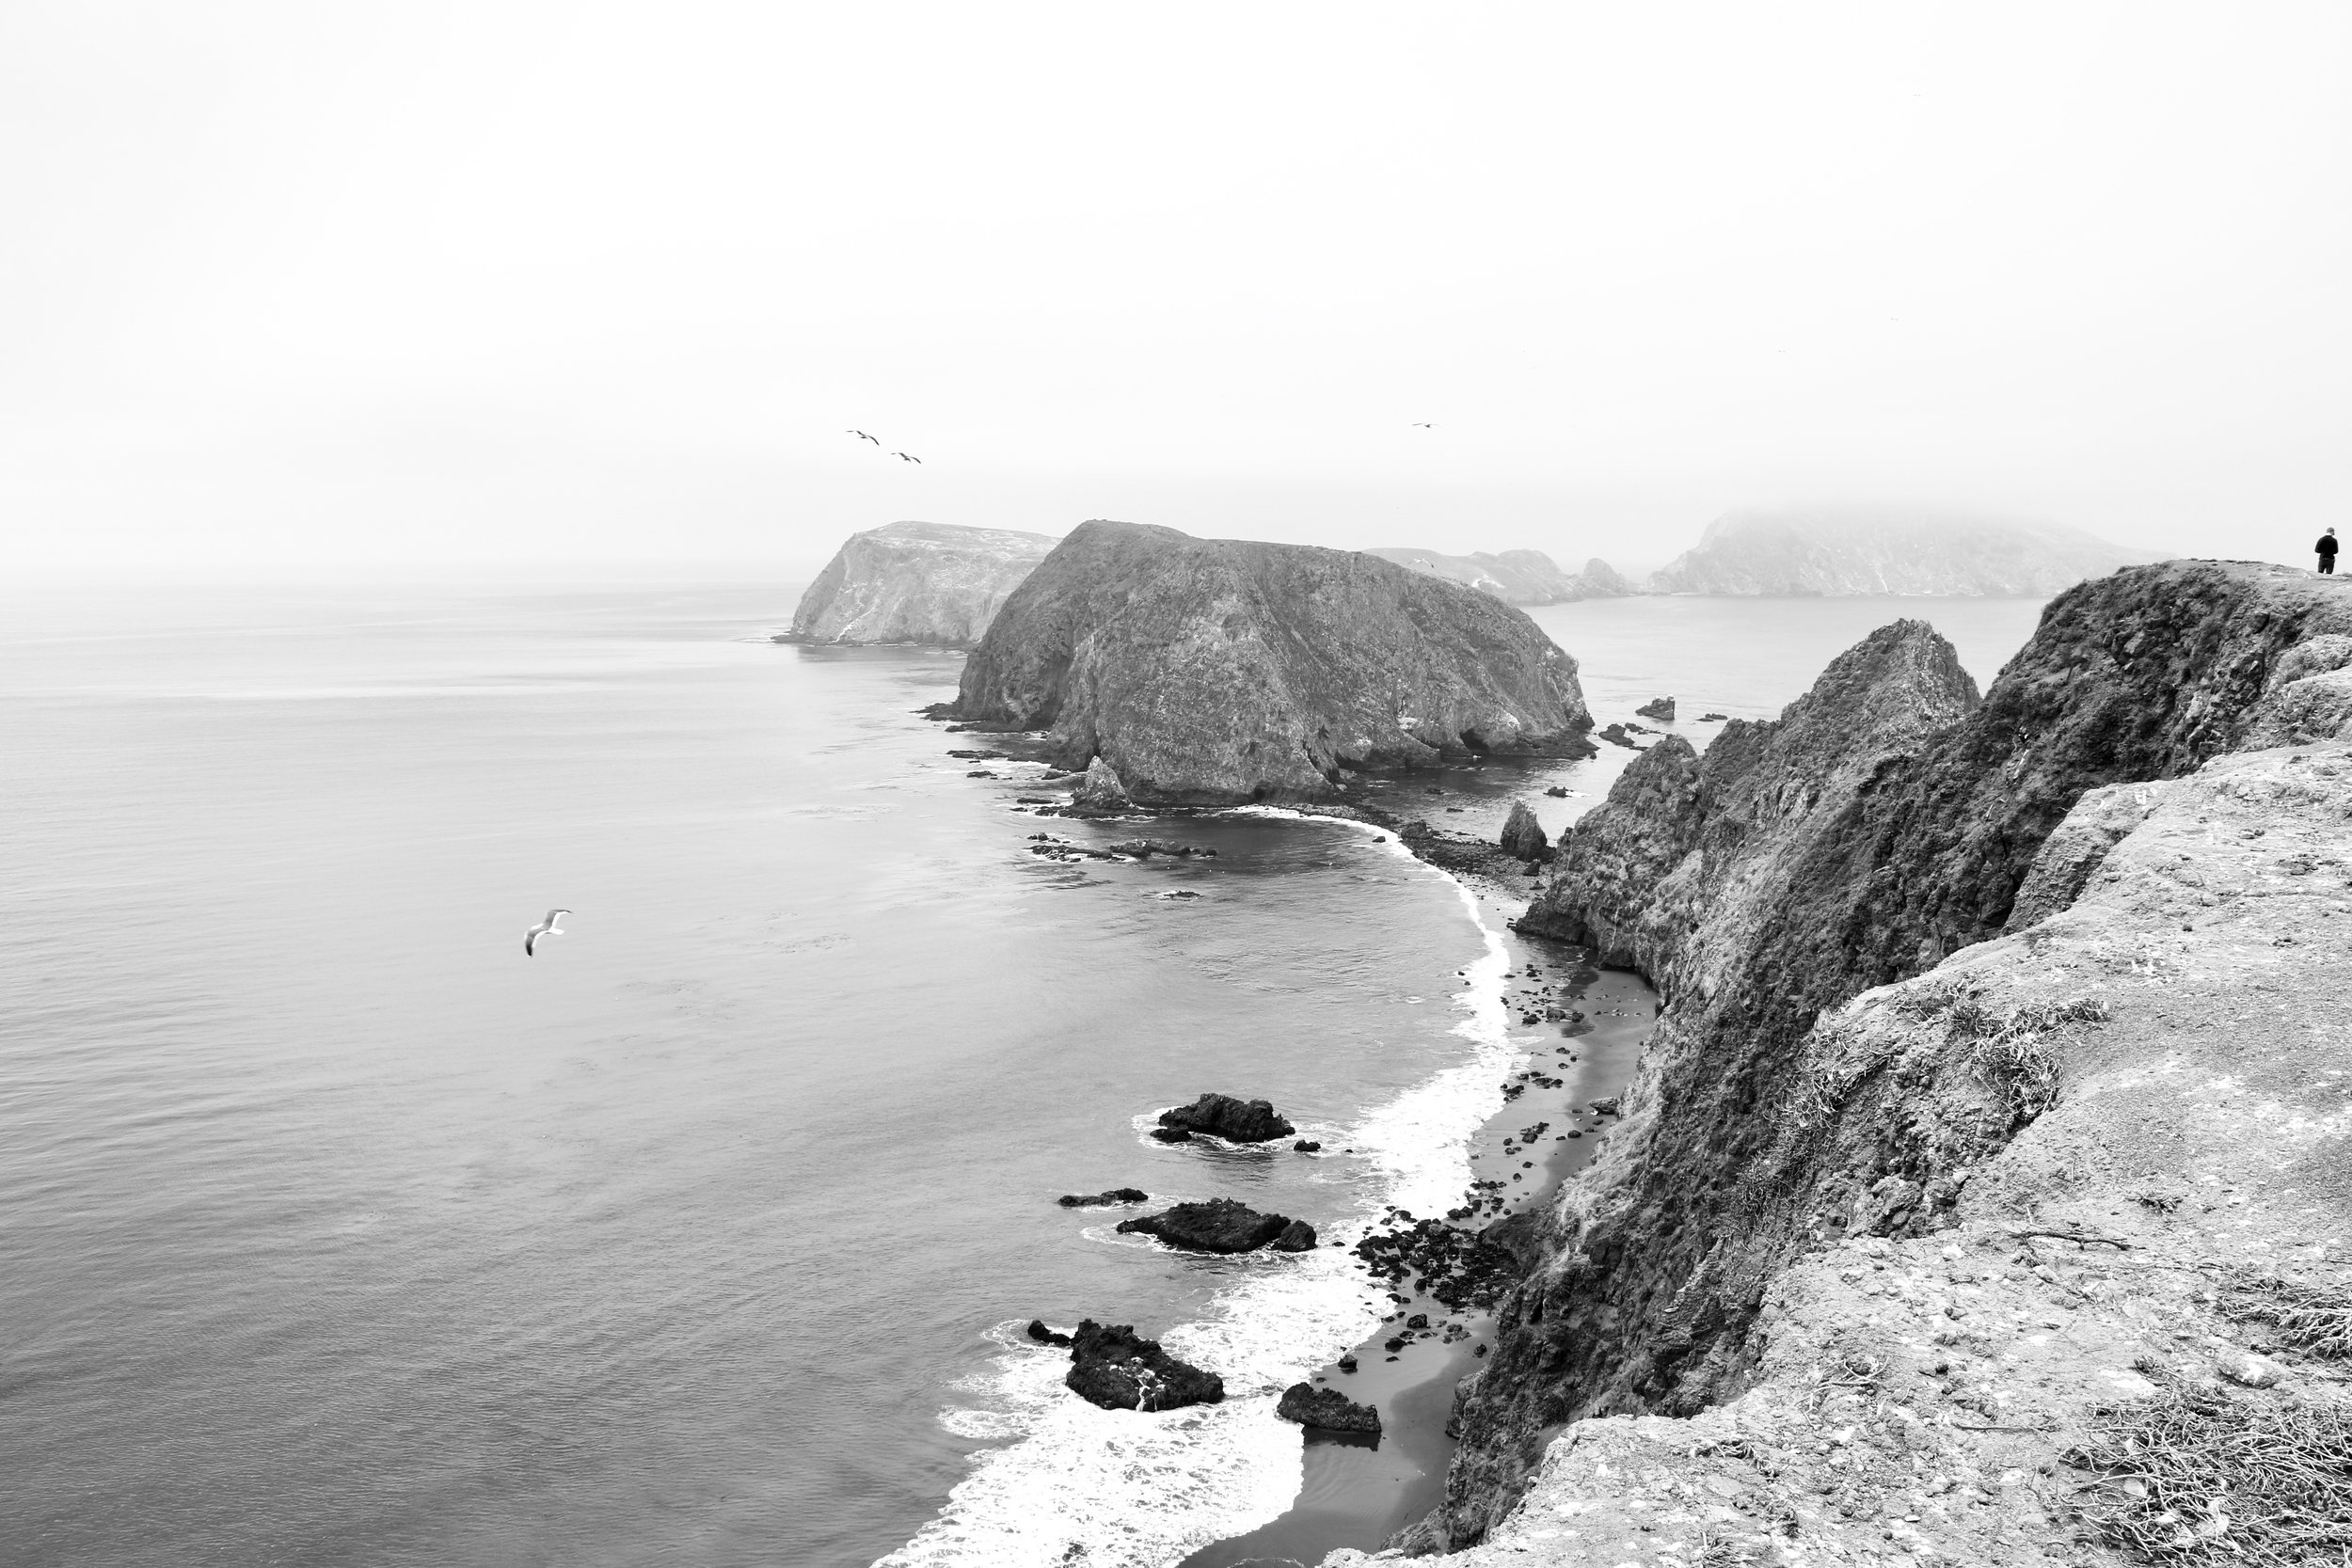 Man Versus Nature - Anacapa Island, Channel Islands